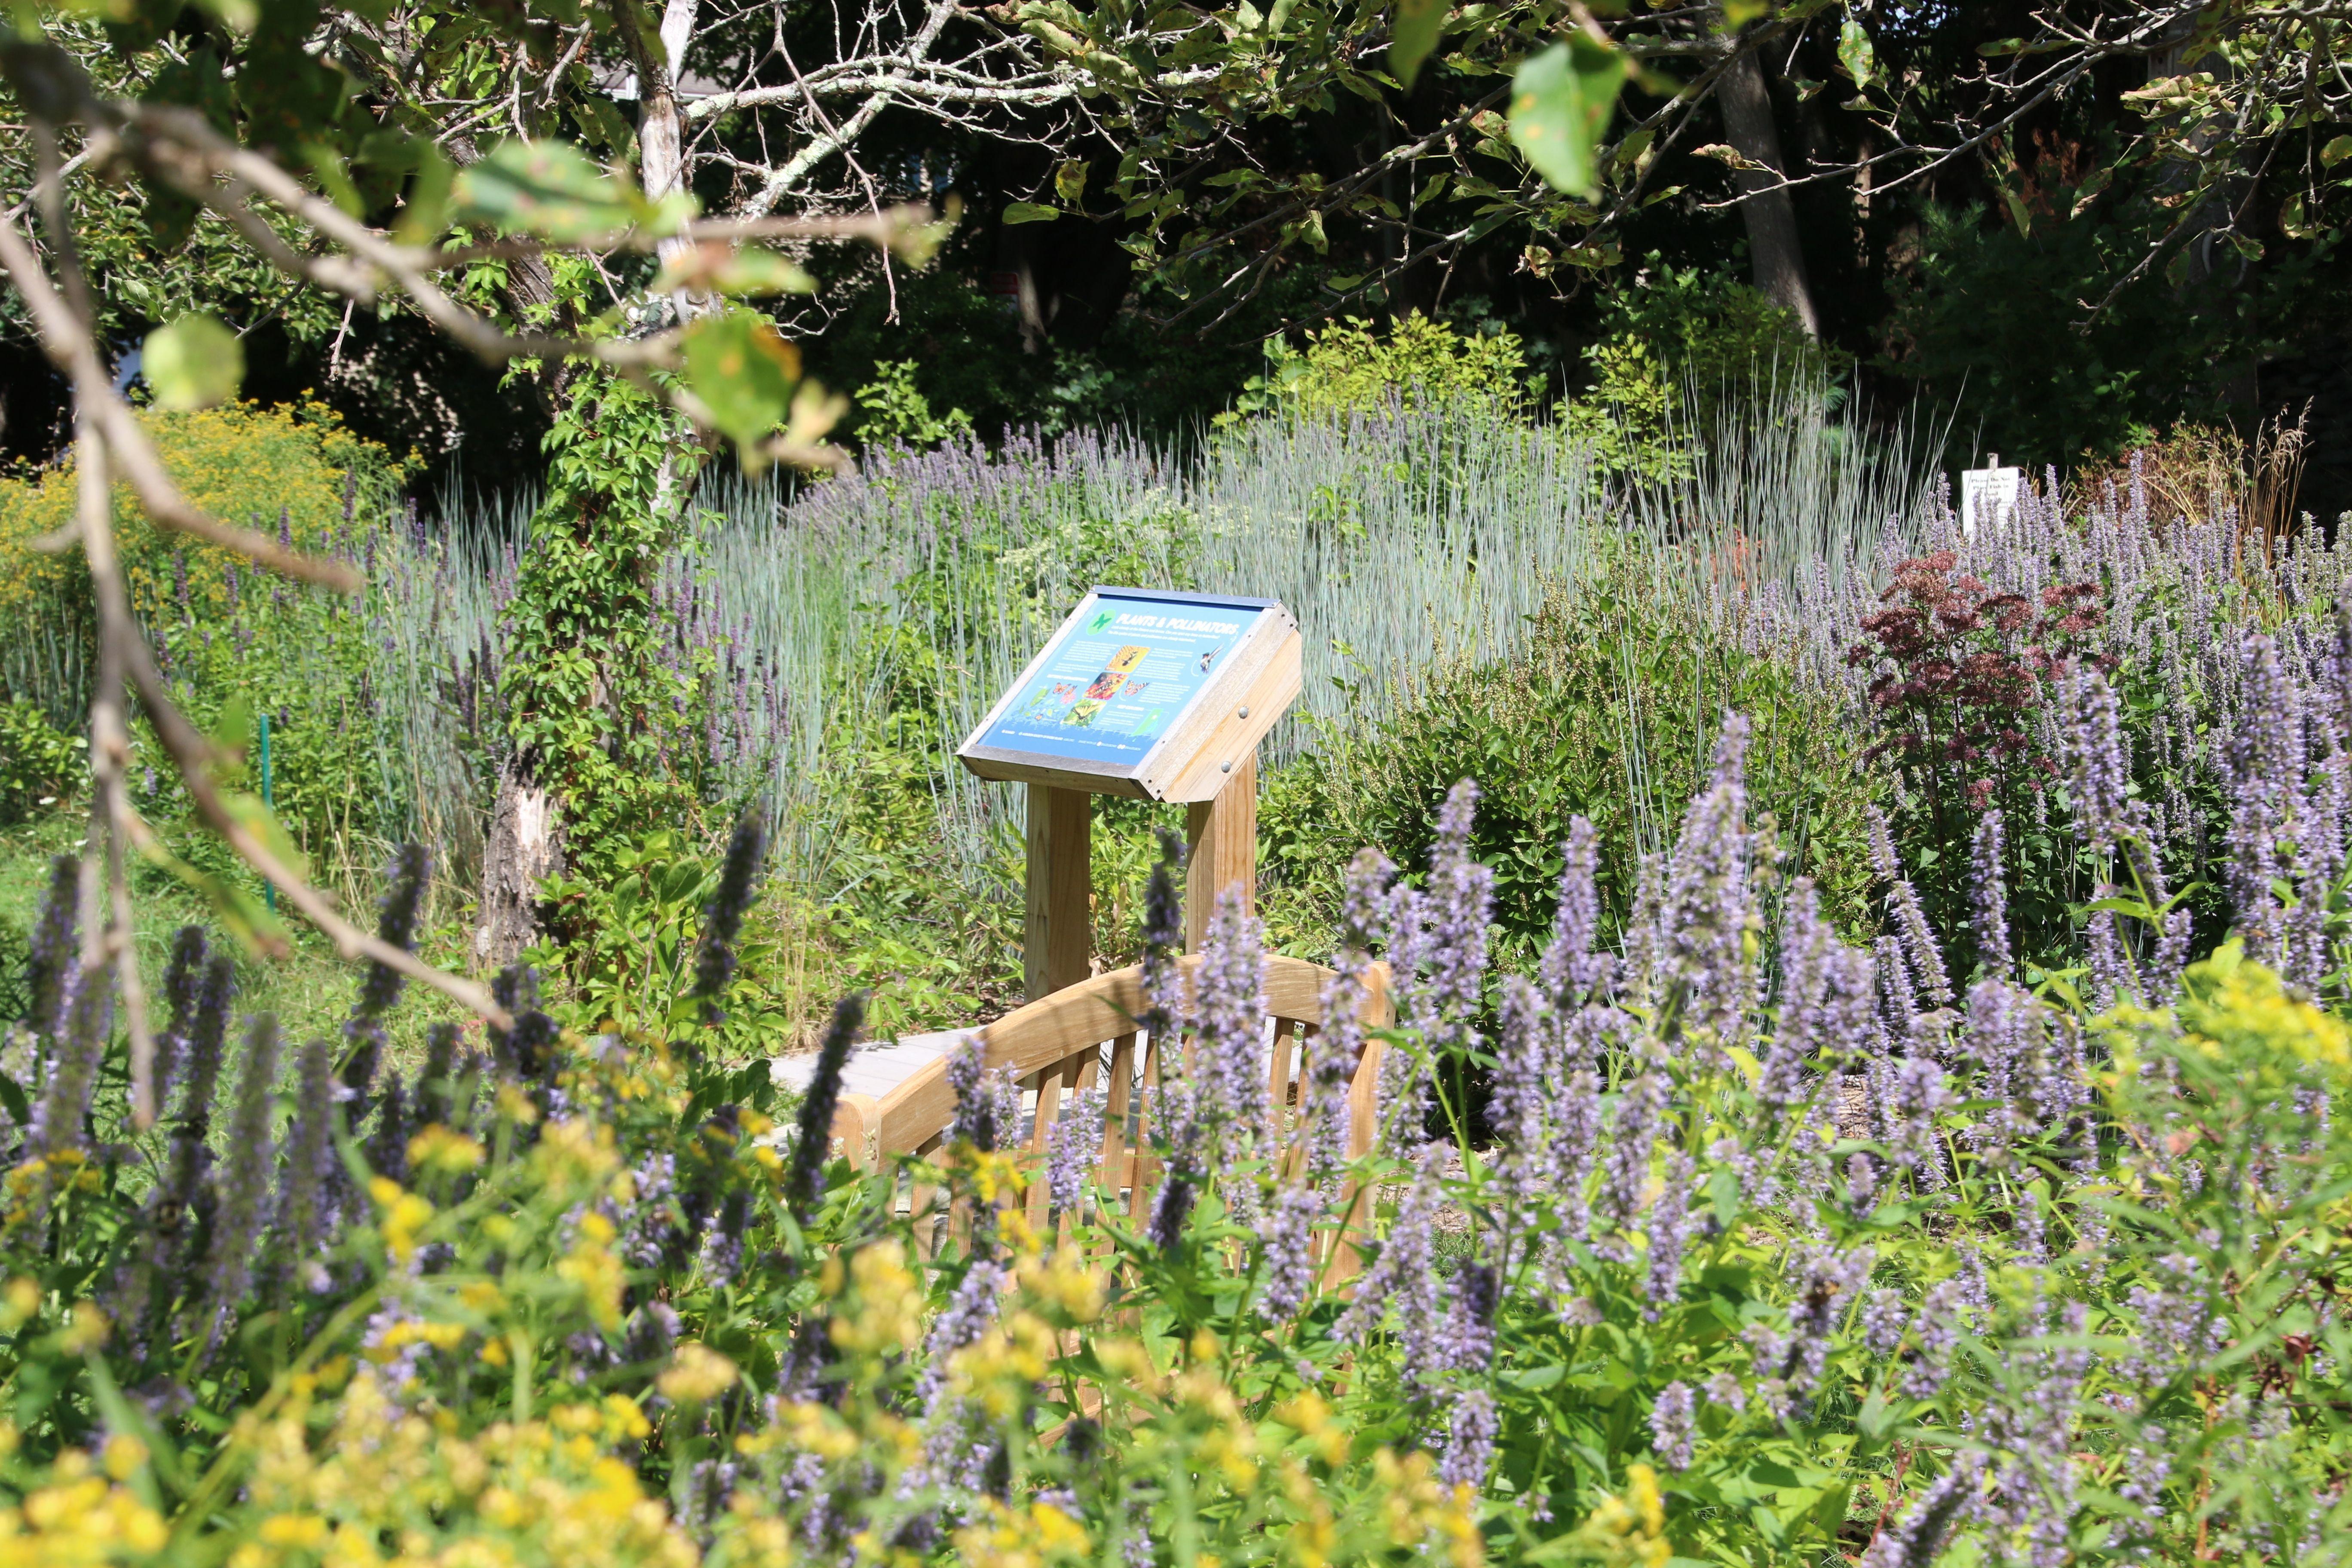 Audubon Rose Pollinator Discovery Garden Web Content Coming Soon